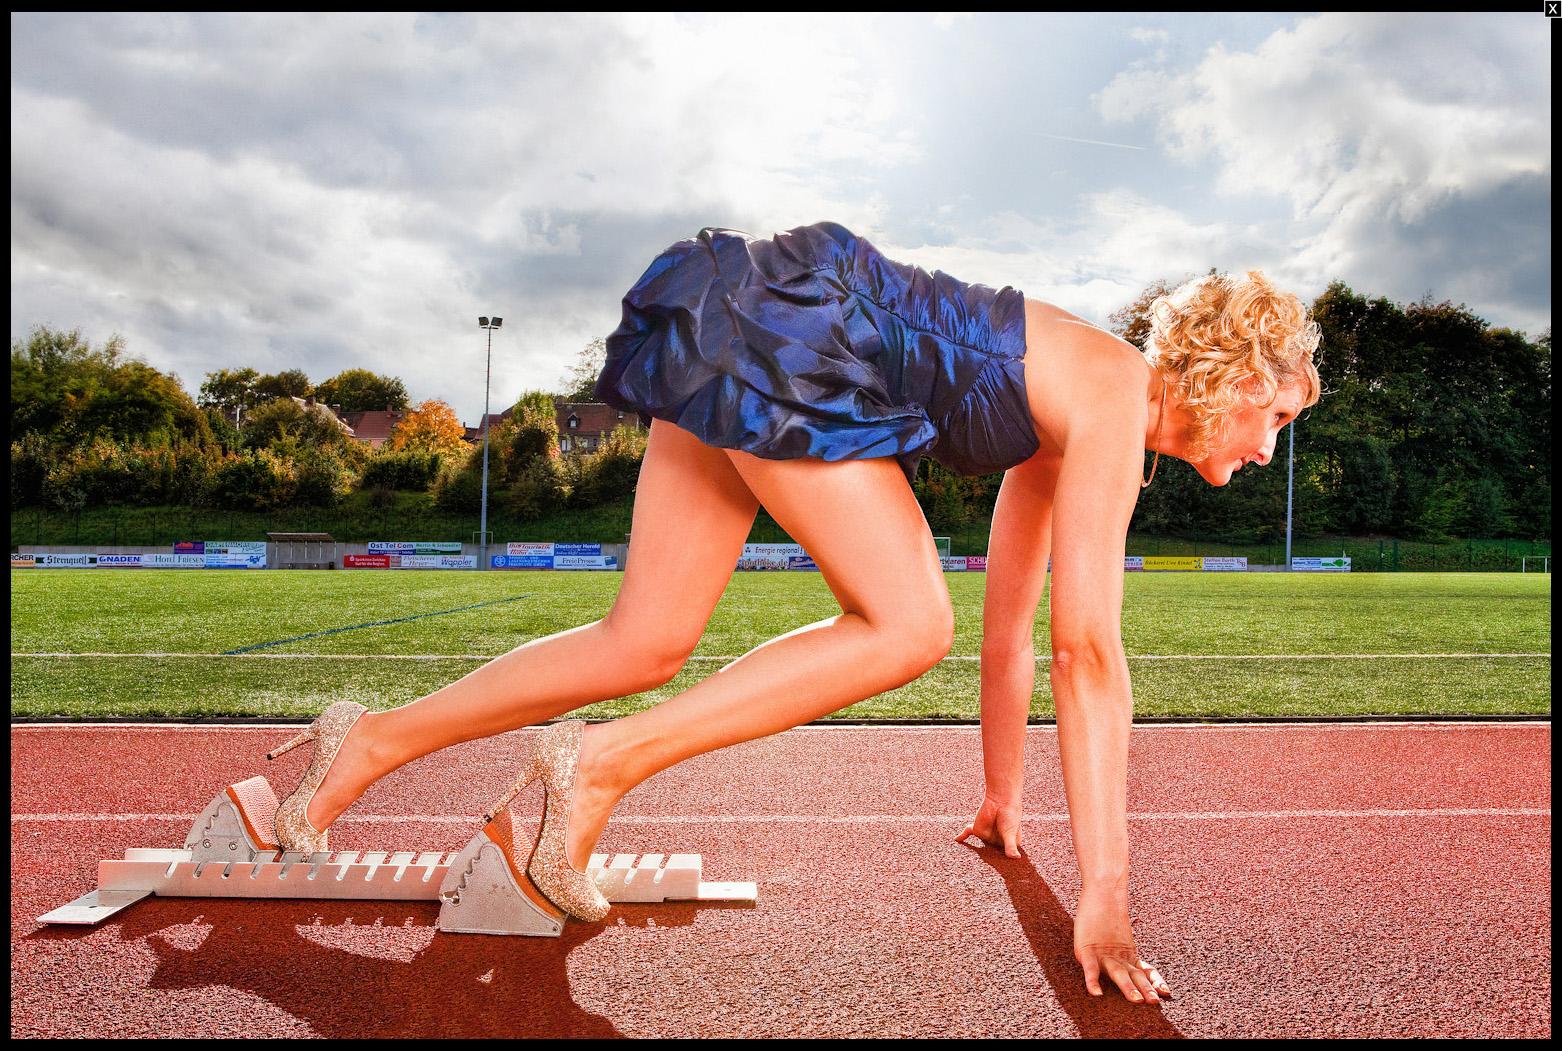 World's Fastest 100m In High Heels